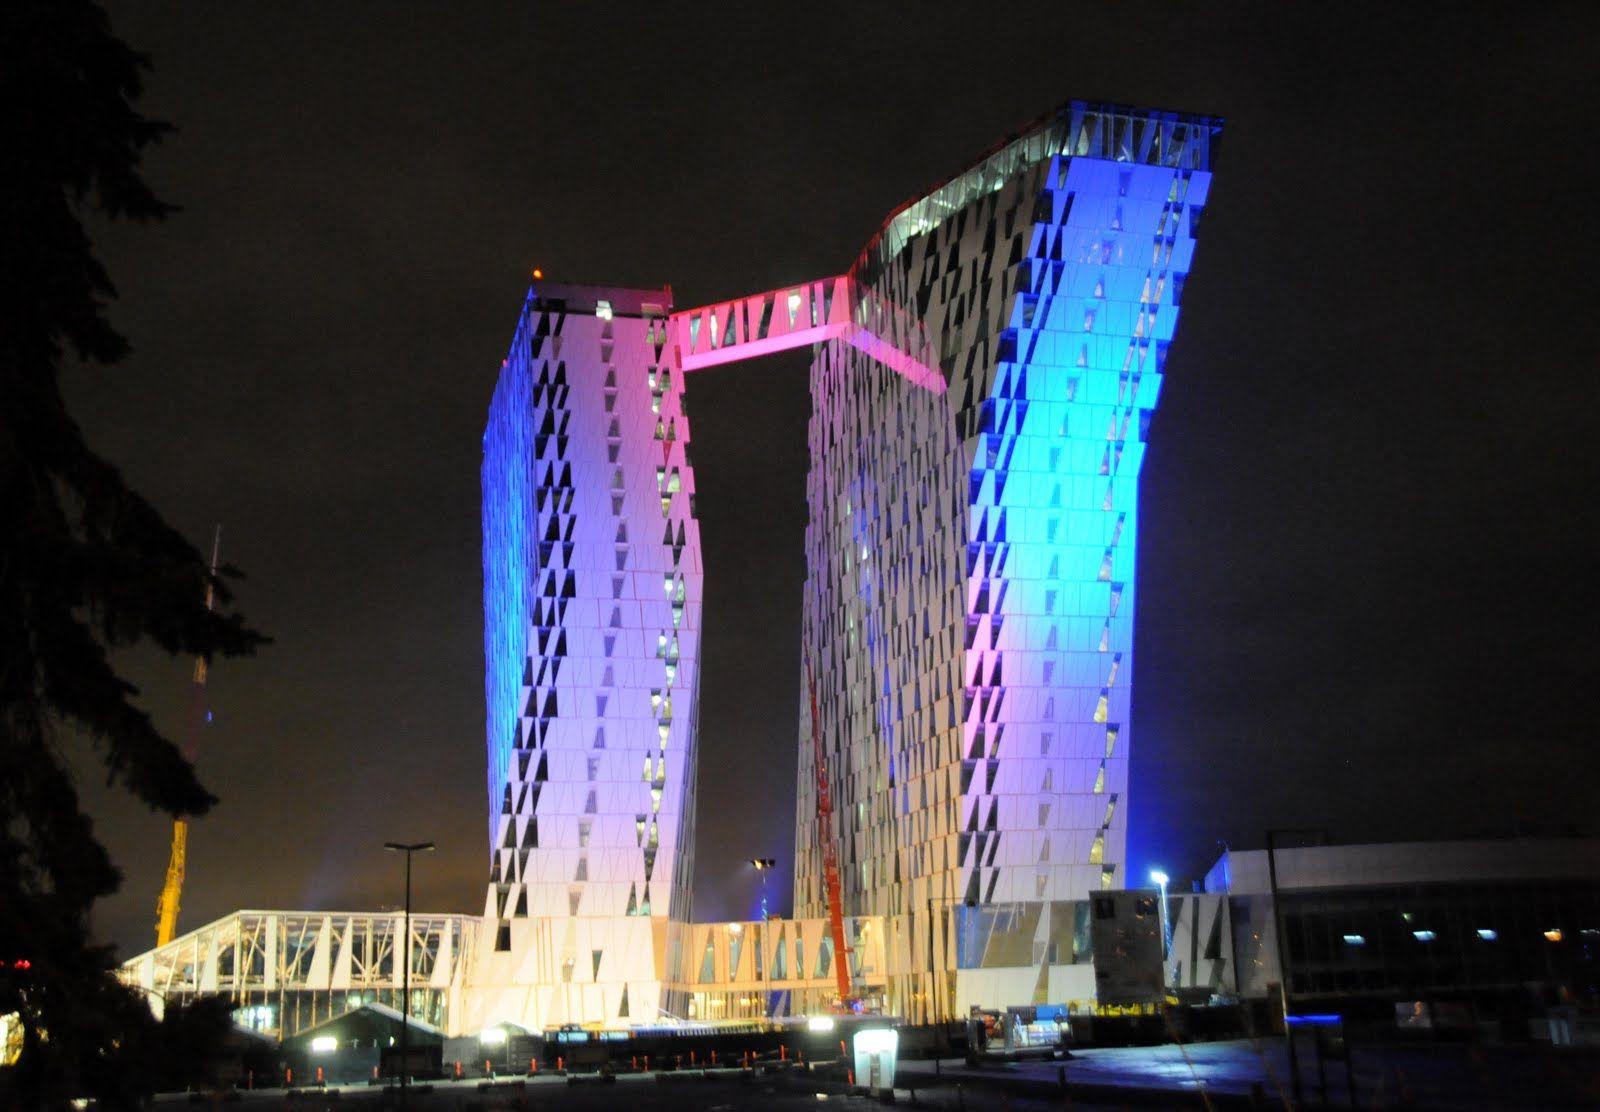 Bella Sky Google Sogning Unusual Buildings Conference Hotel